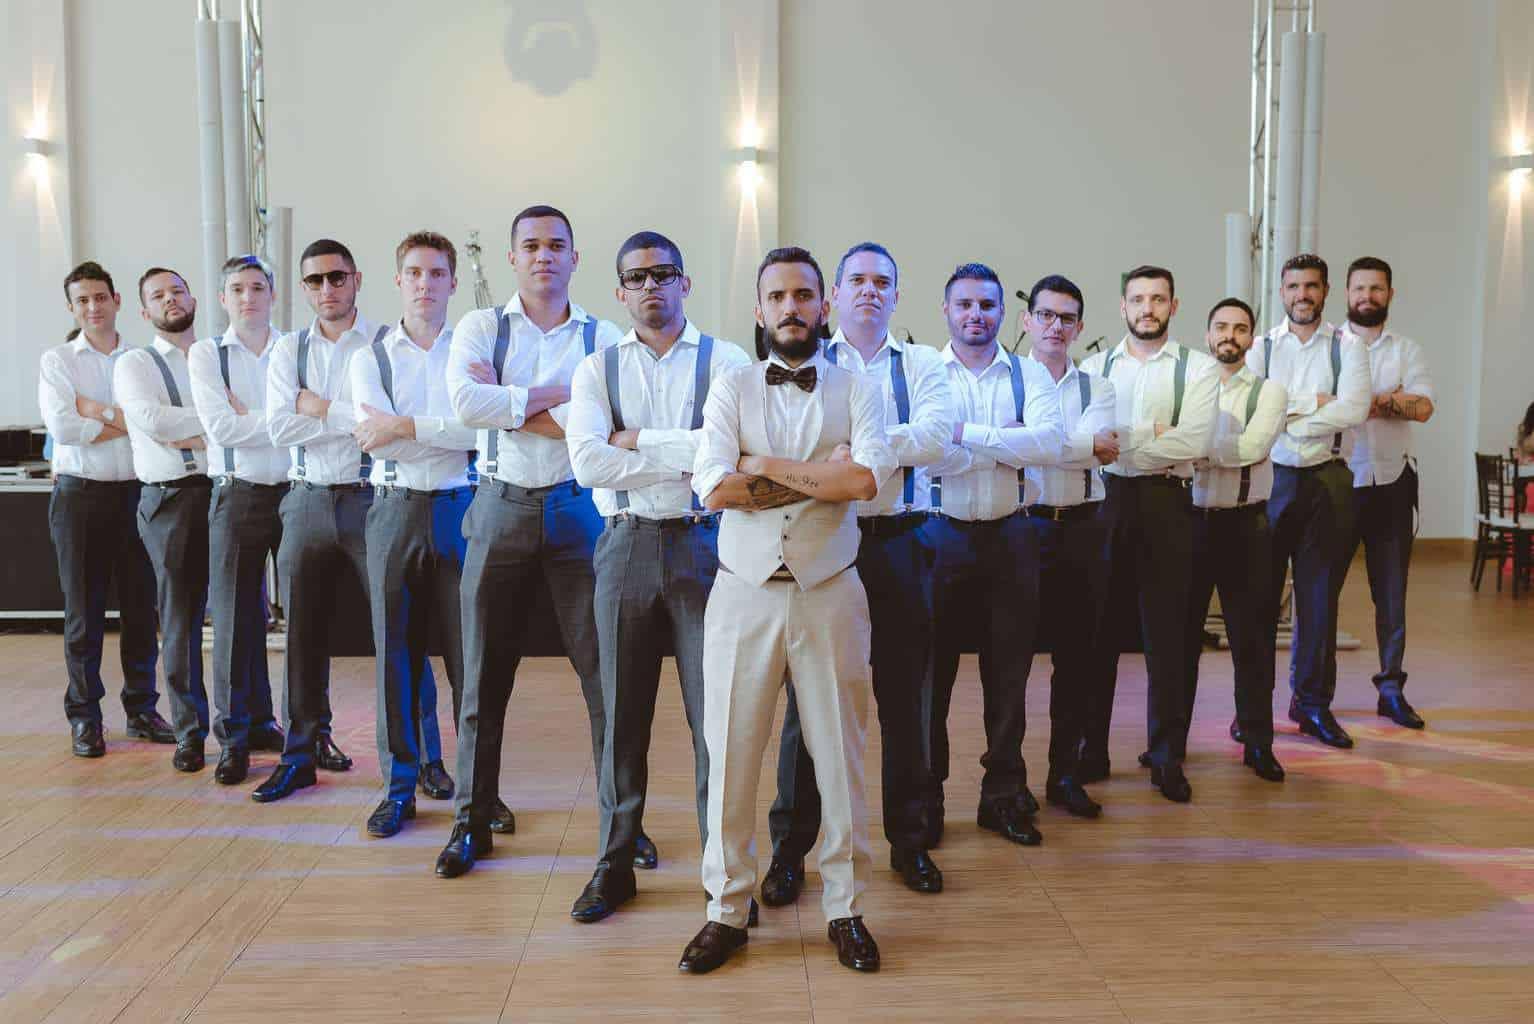 casamento-ao-ar-livre-casamento-boho-casamento-geek-casamento-rustico-casamento-Thais-e-Pedro-Revoar-Fotografia-Villa-Borghese-Eventos-60